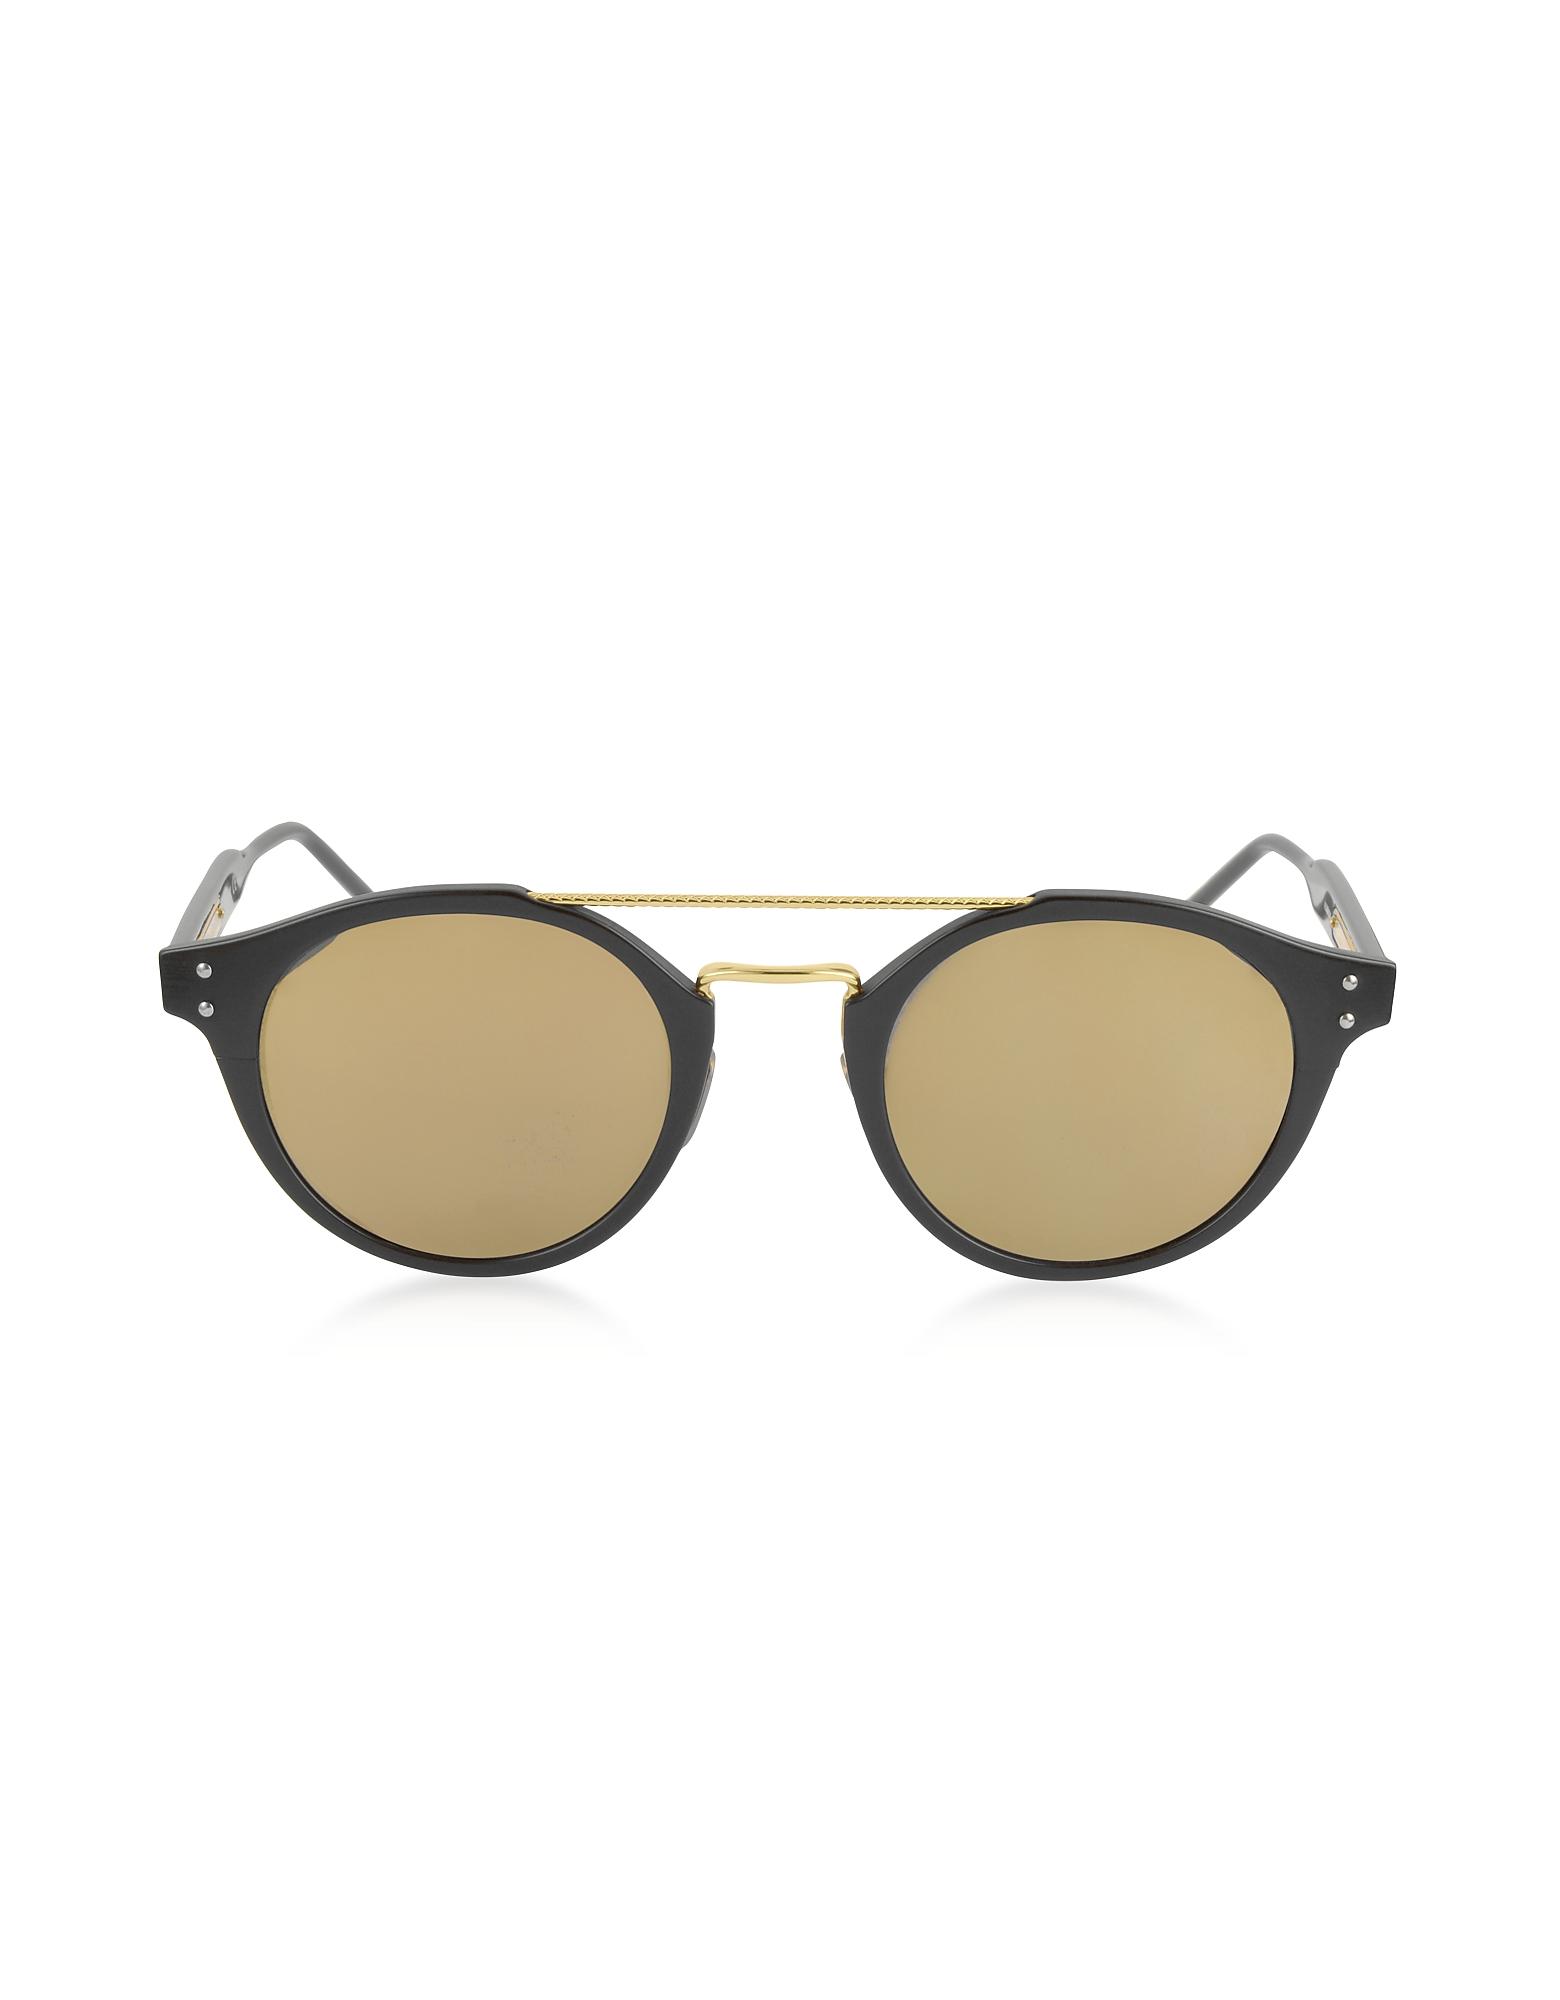 Bottega Veneta Sunglasses, BV0078S Round Acetate and Metal Frame Unisex Sunglasses